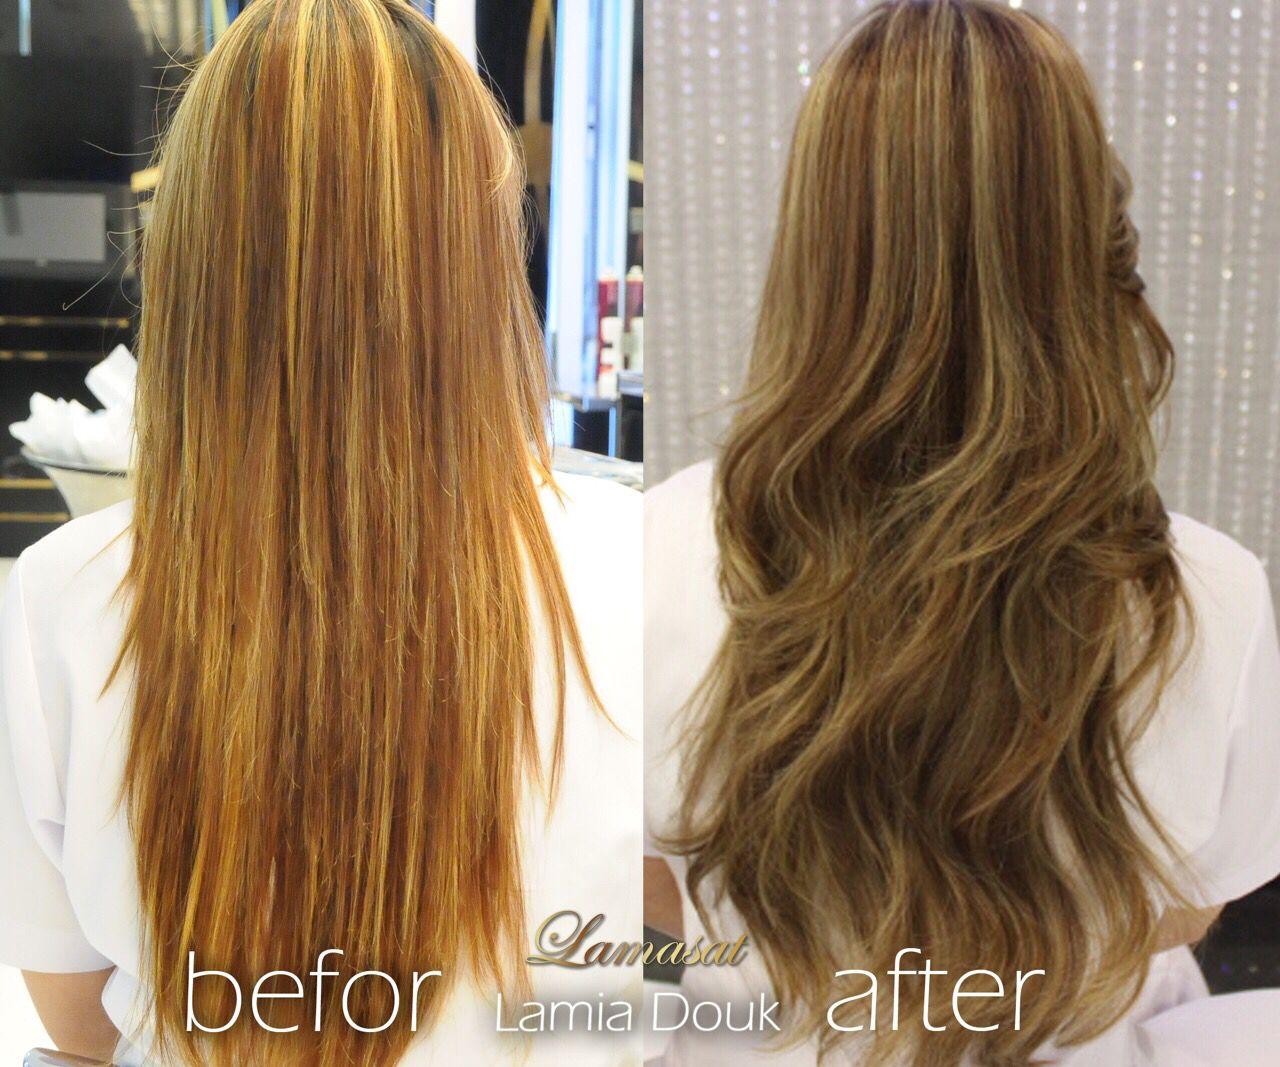 Hair Coloration By Lamia Douk Lamasat Beauty Center المختصة لمياء الضوق Low Light Color لمسات جدة فرع الخالدية لمسات ب Hair Styles Long Hair Styles Beauty